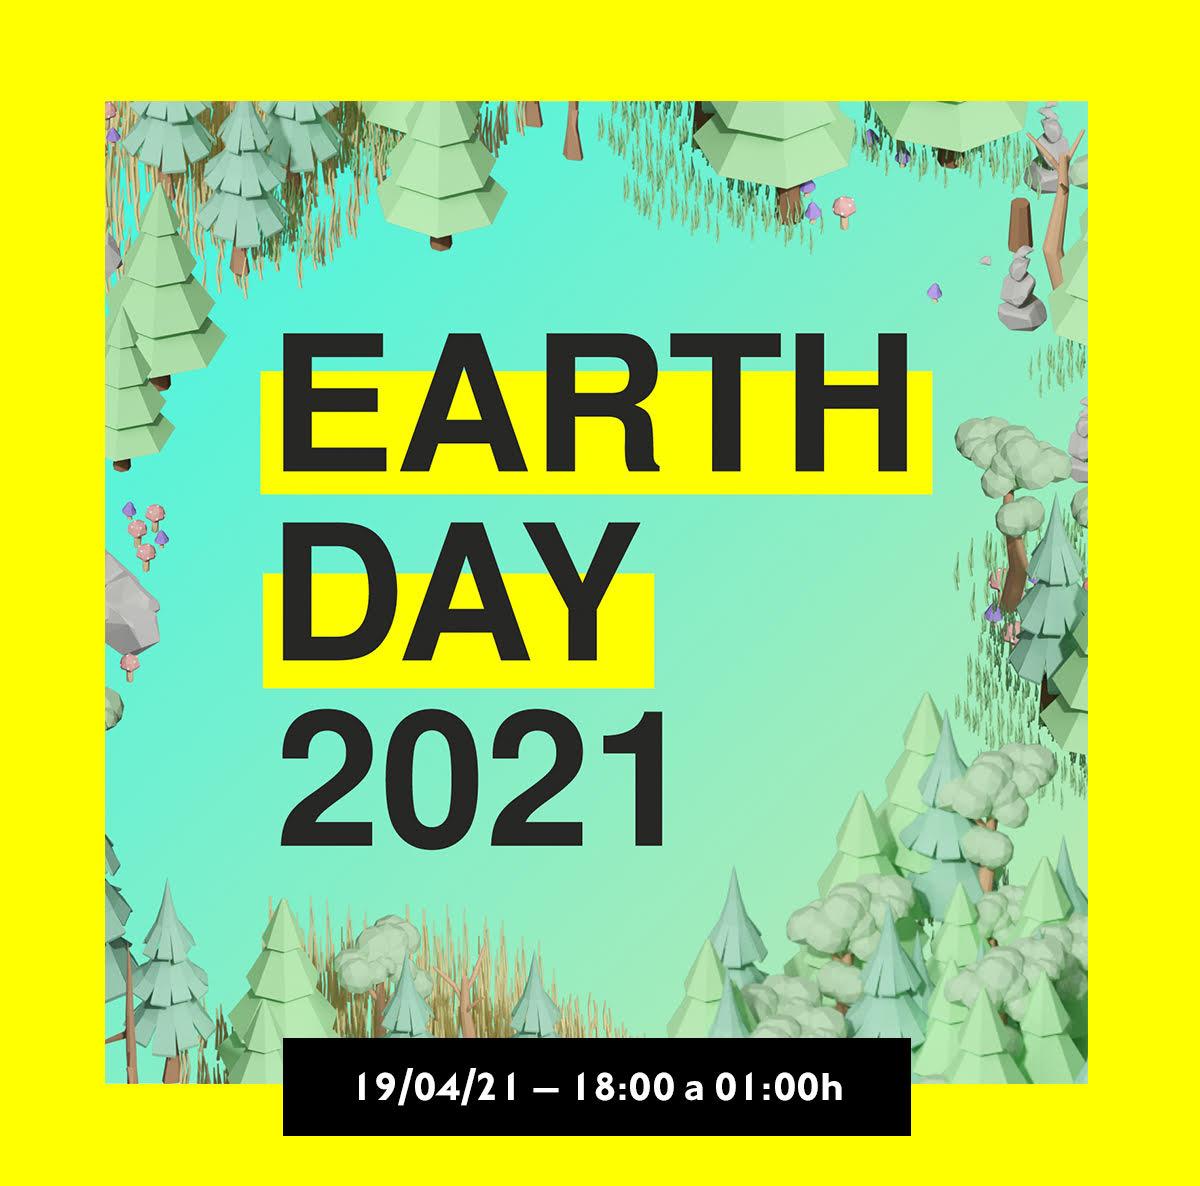 300 árboles para Earth Day 2021 — Delicious & Sons